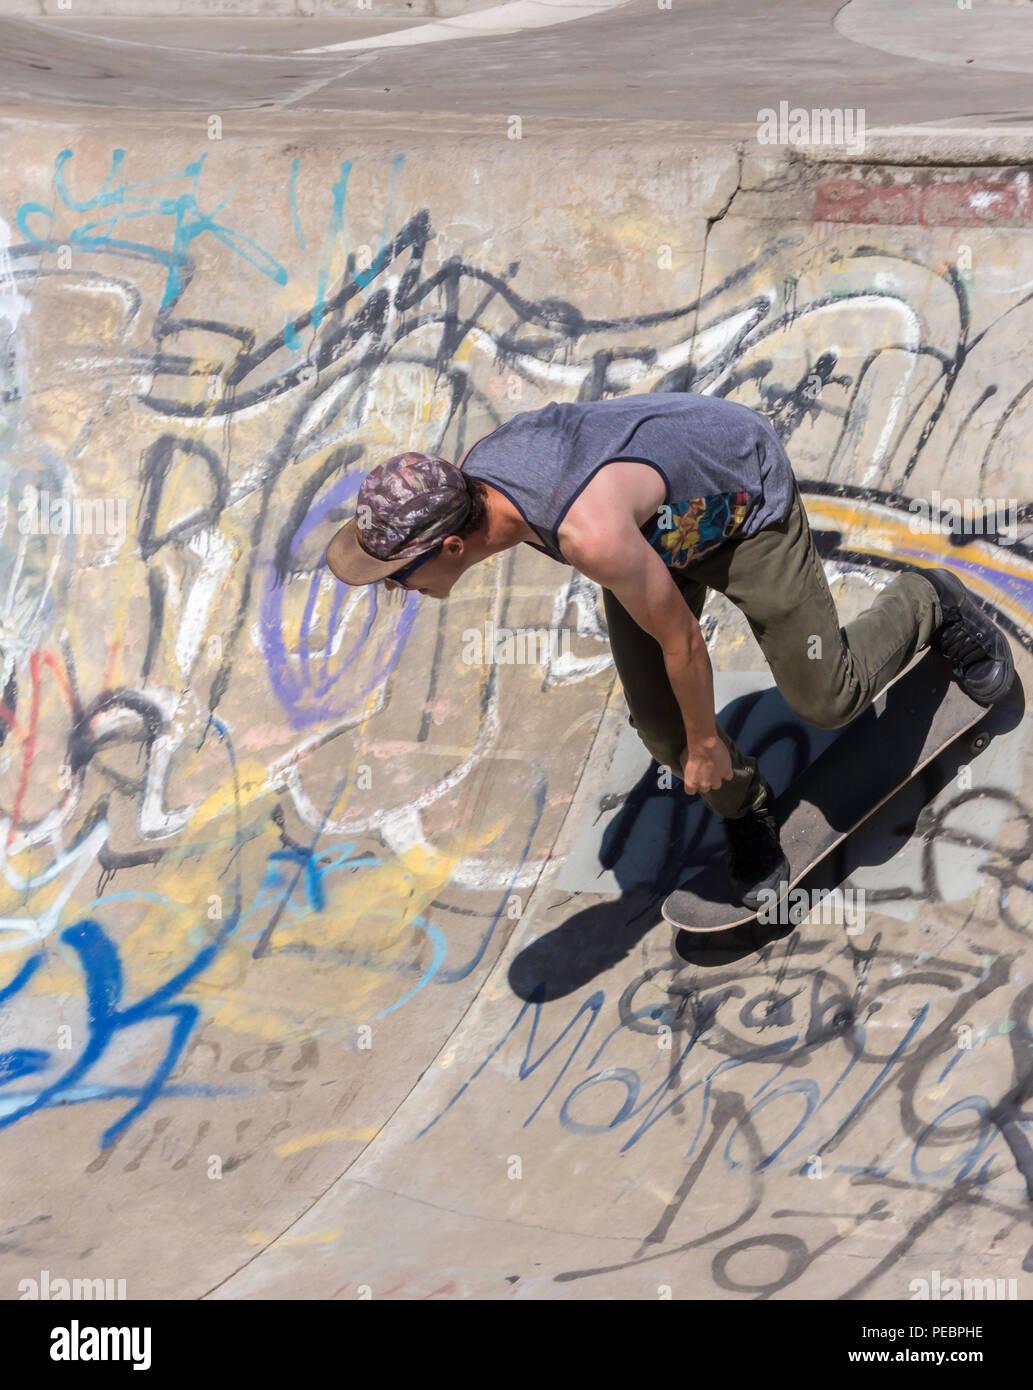 Young Man Skateboarding at the Riverside River Yard Skateboard Bowl, Great Fall, Montana, USA - Stock Image